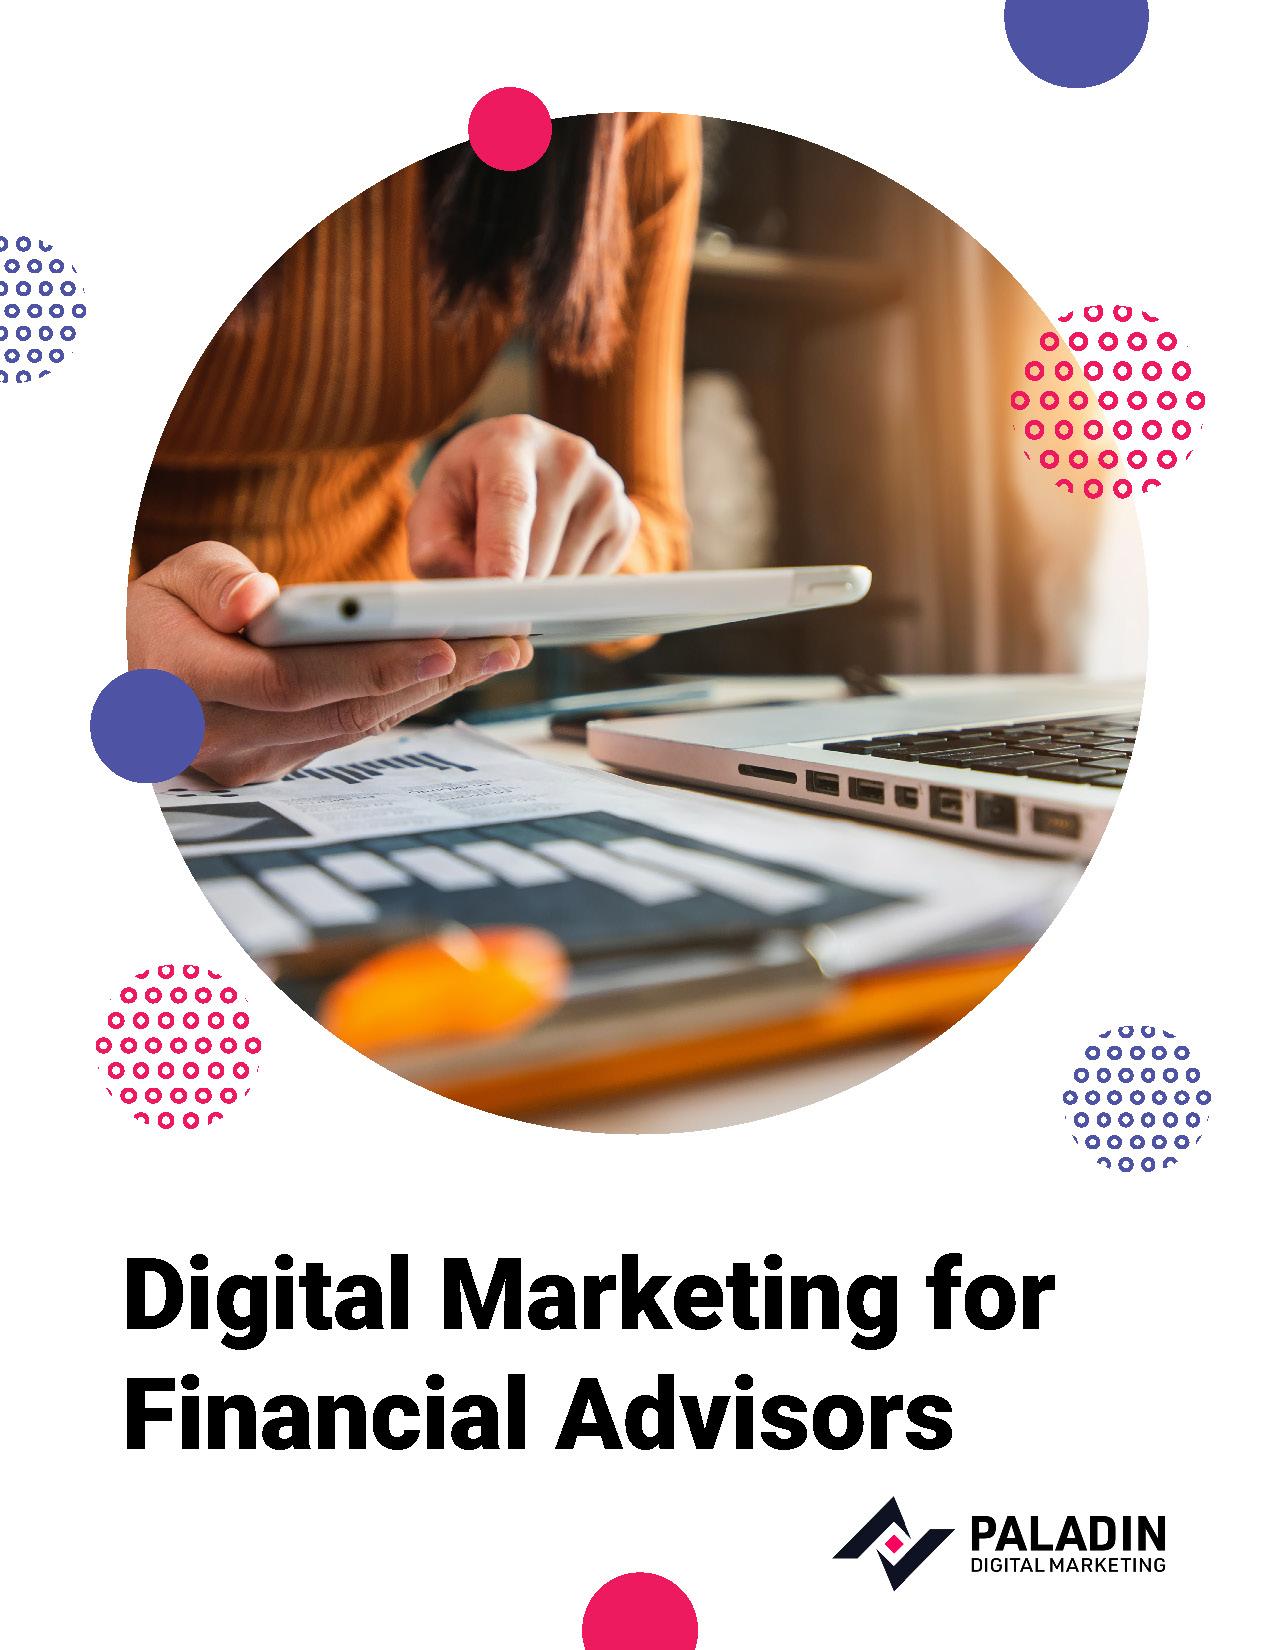 eBook-Digital Marketing for Financial Advisors